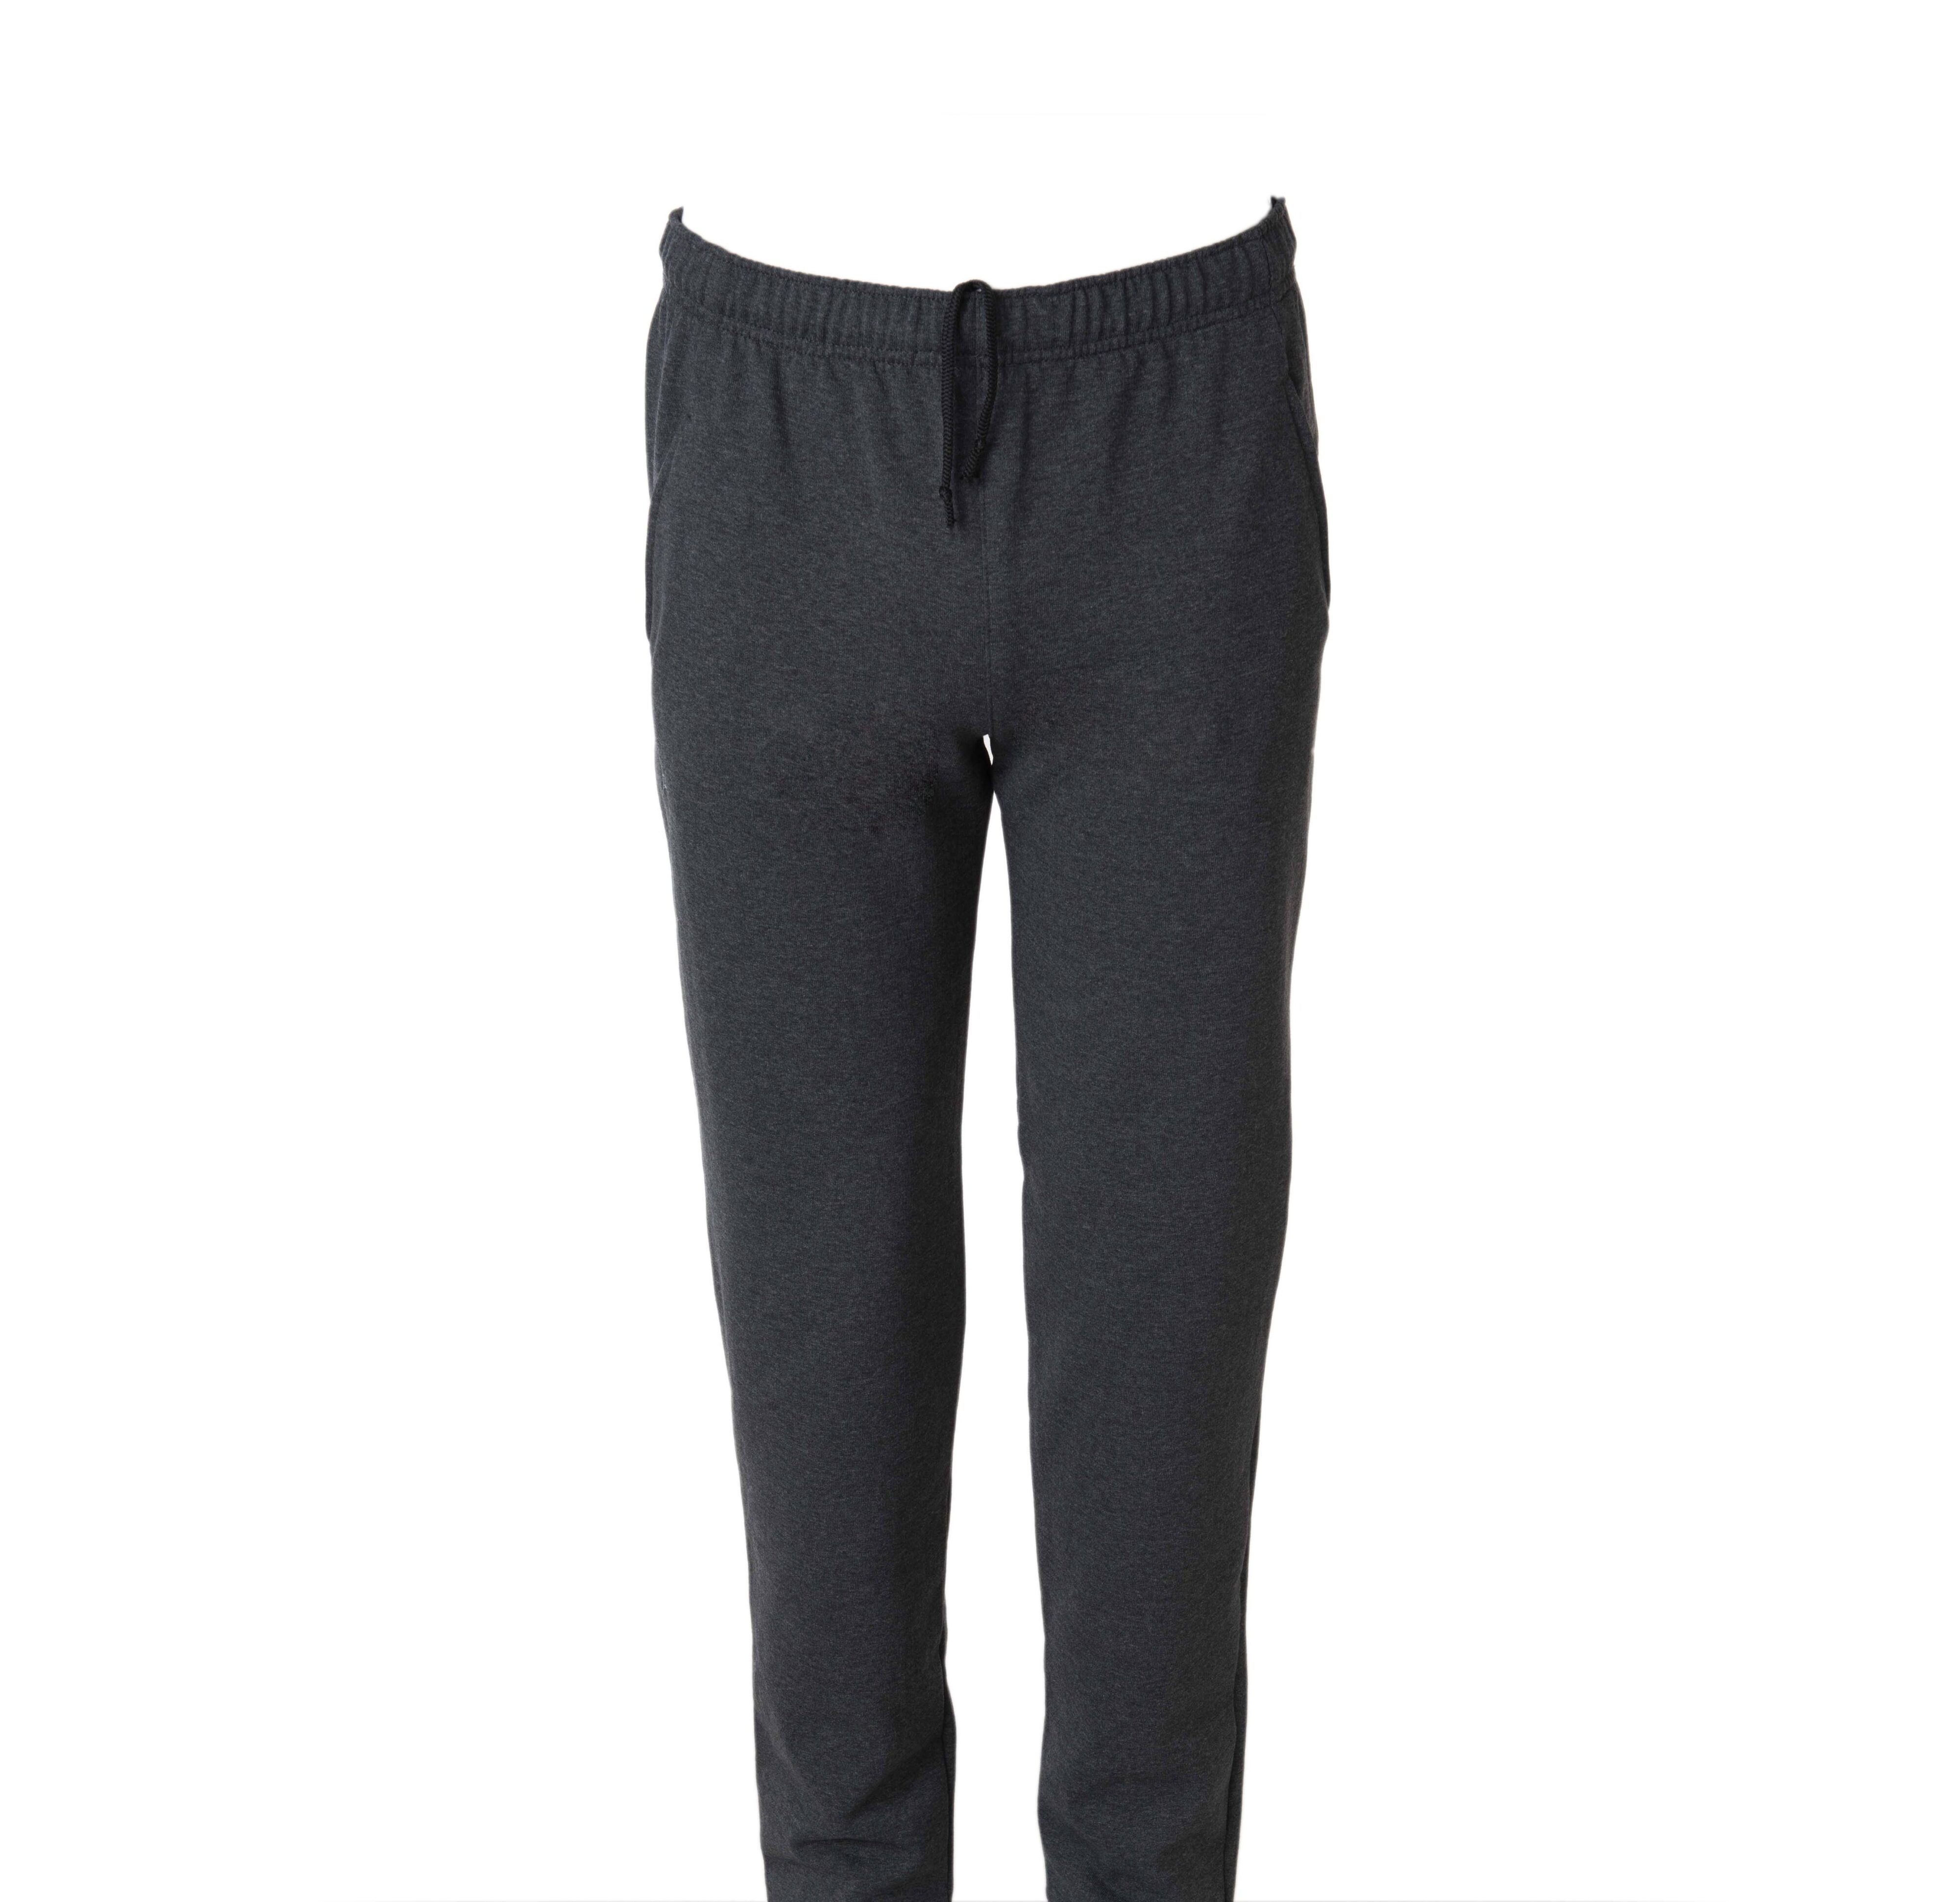 Pantalon Chandal Con Felpa Marca Blaper Tallas Grandes P 9xl